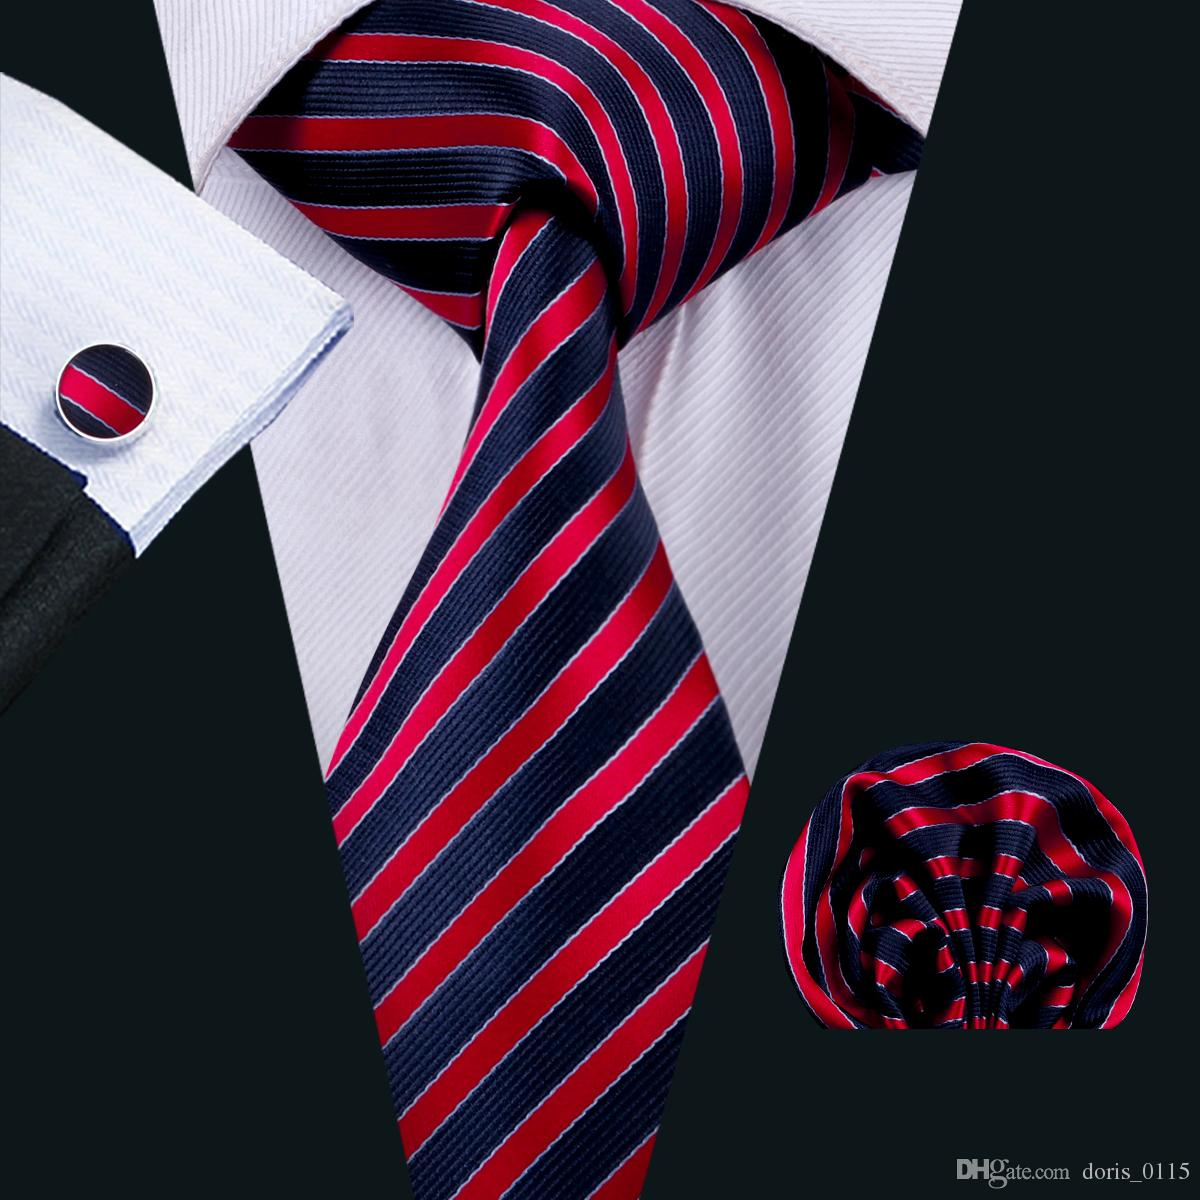 b9506d2da755 2019 Classic Silk Mens Ties Red Tie Sets Strips Mens Neckties Tie Hanky  Cufflinks Jacquard Woven Meeting Business Wedding Party N 1504 From  Doris_0115, ...